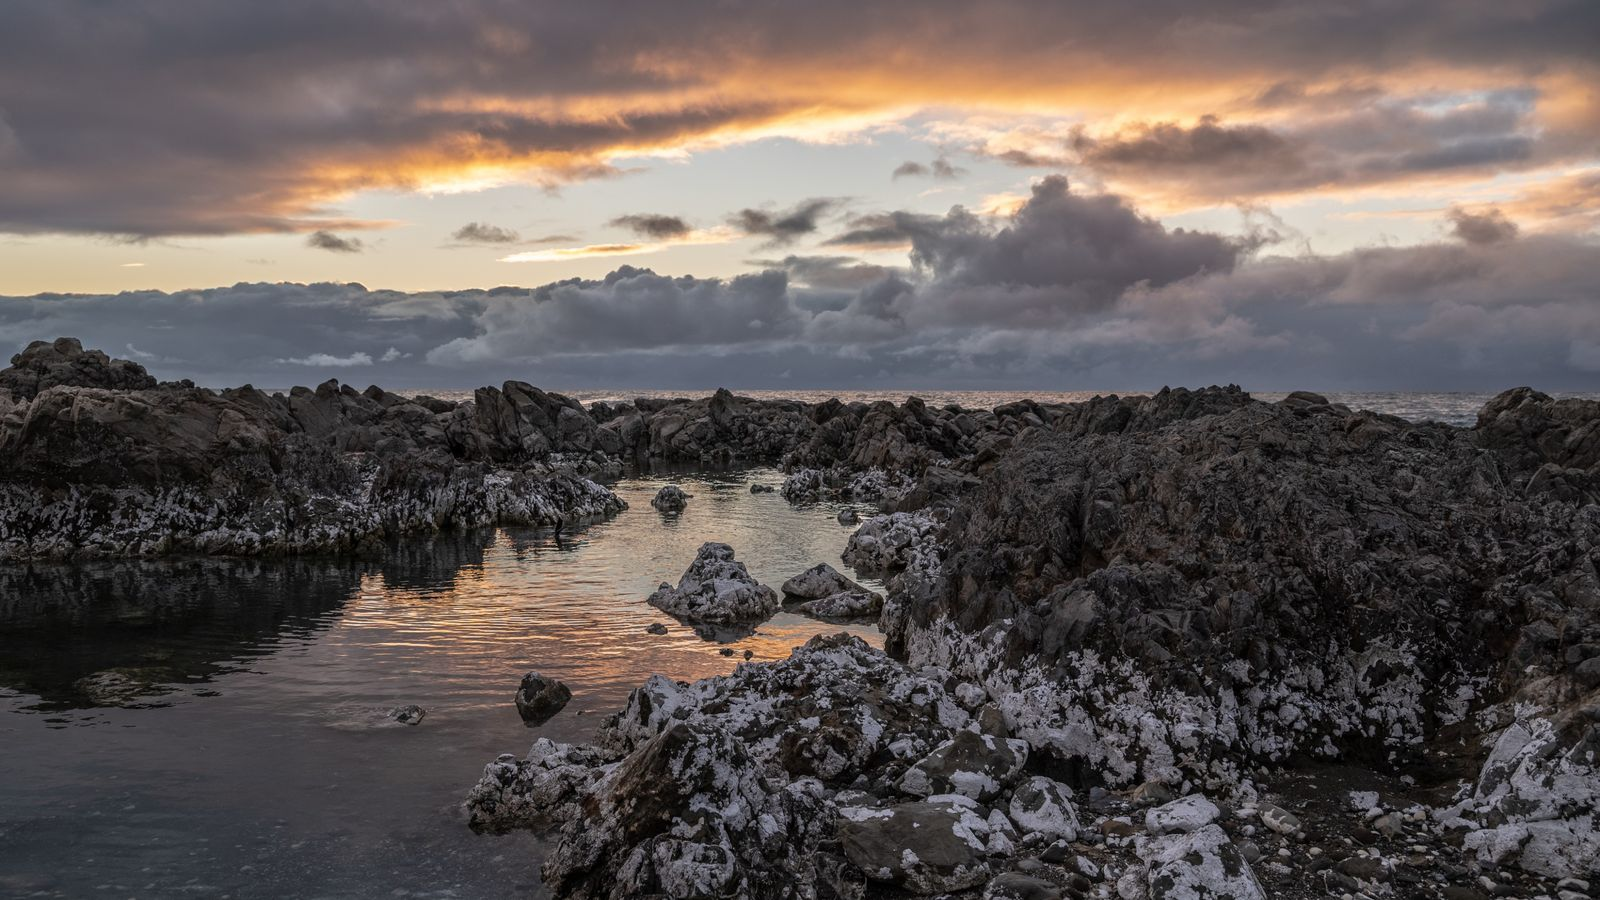 Up close and personal: Kaikōura's wild shores